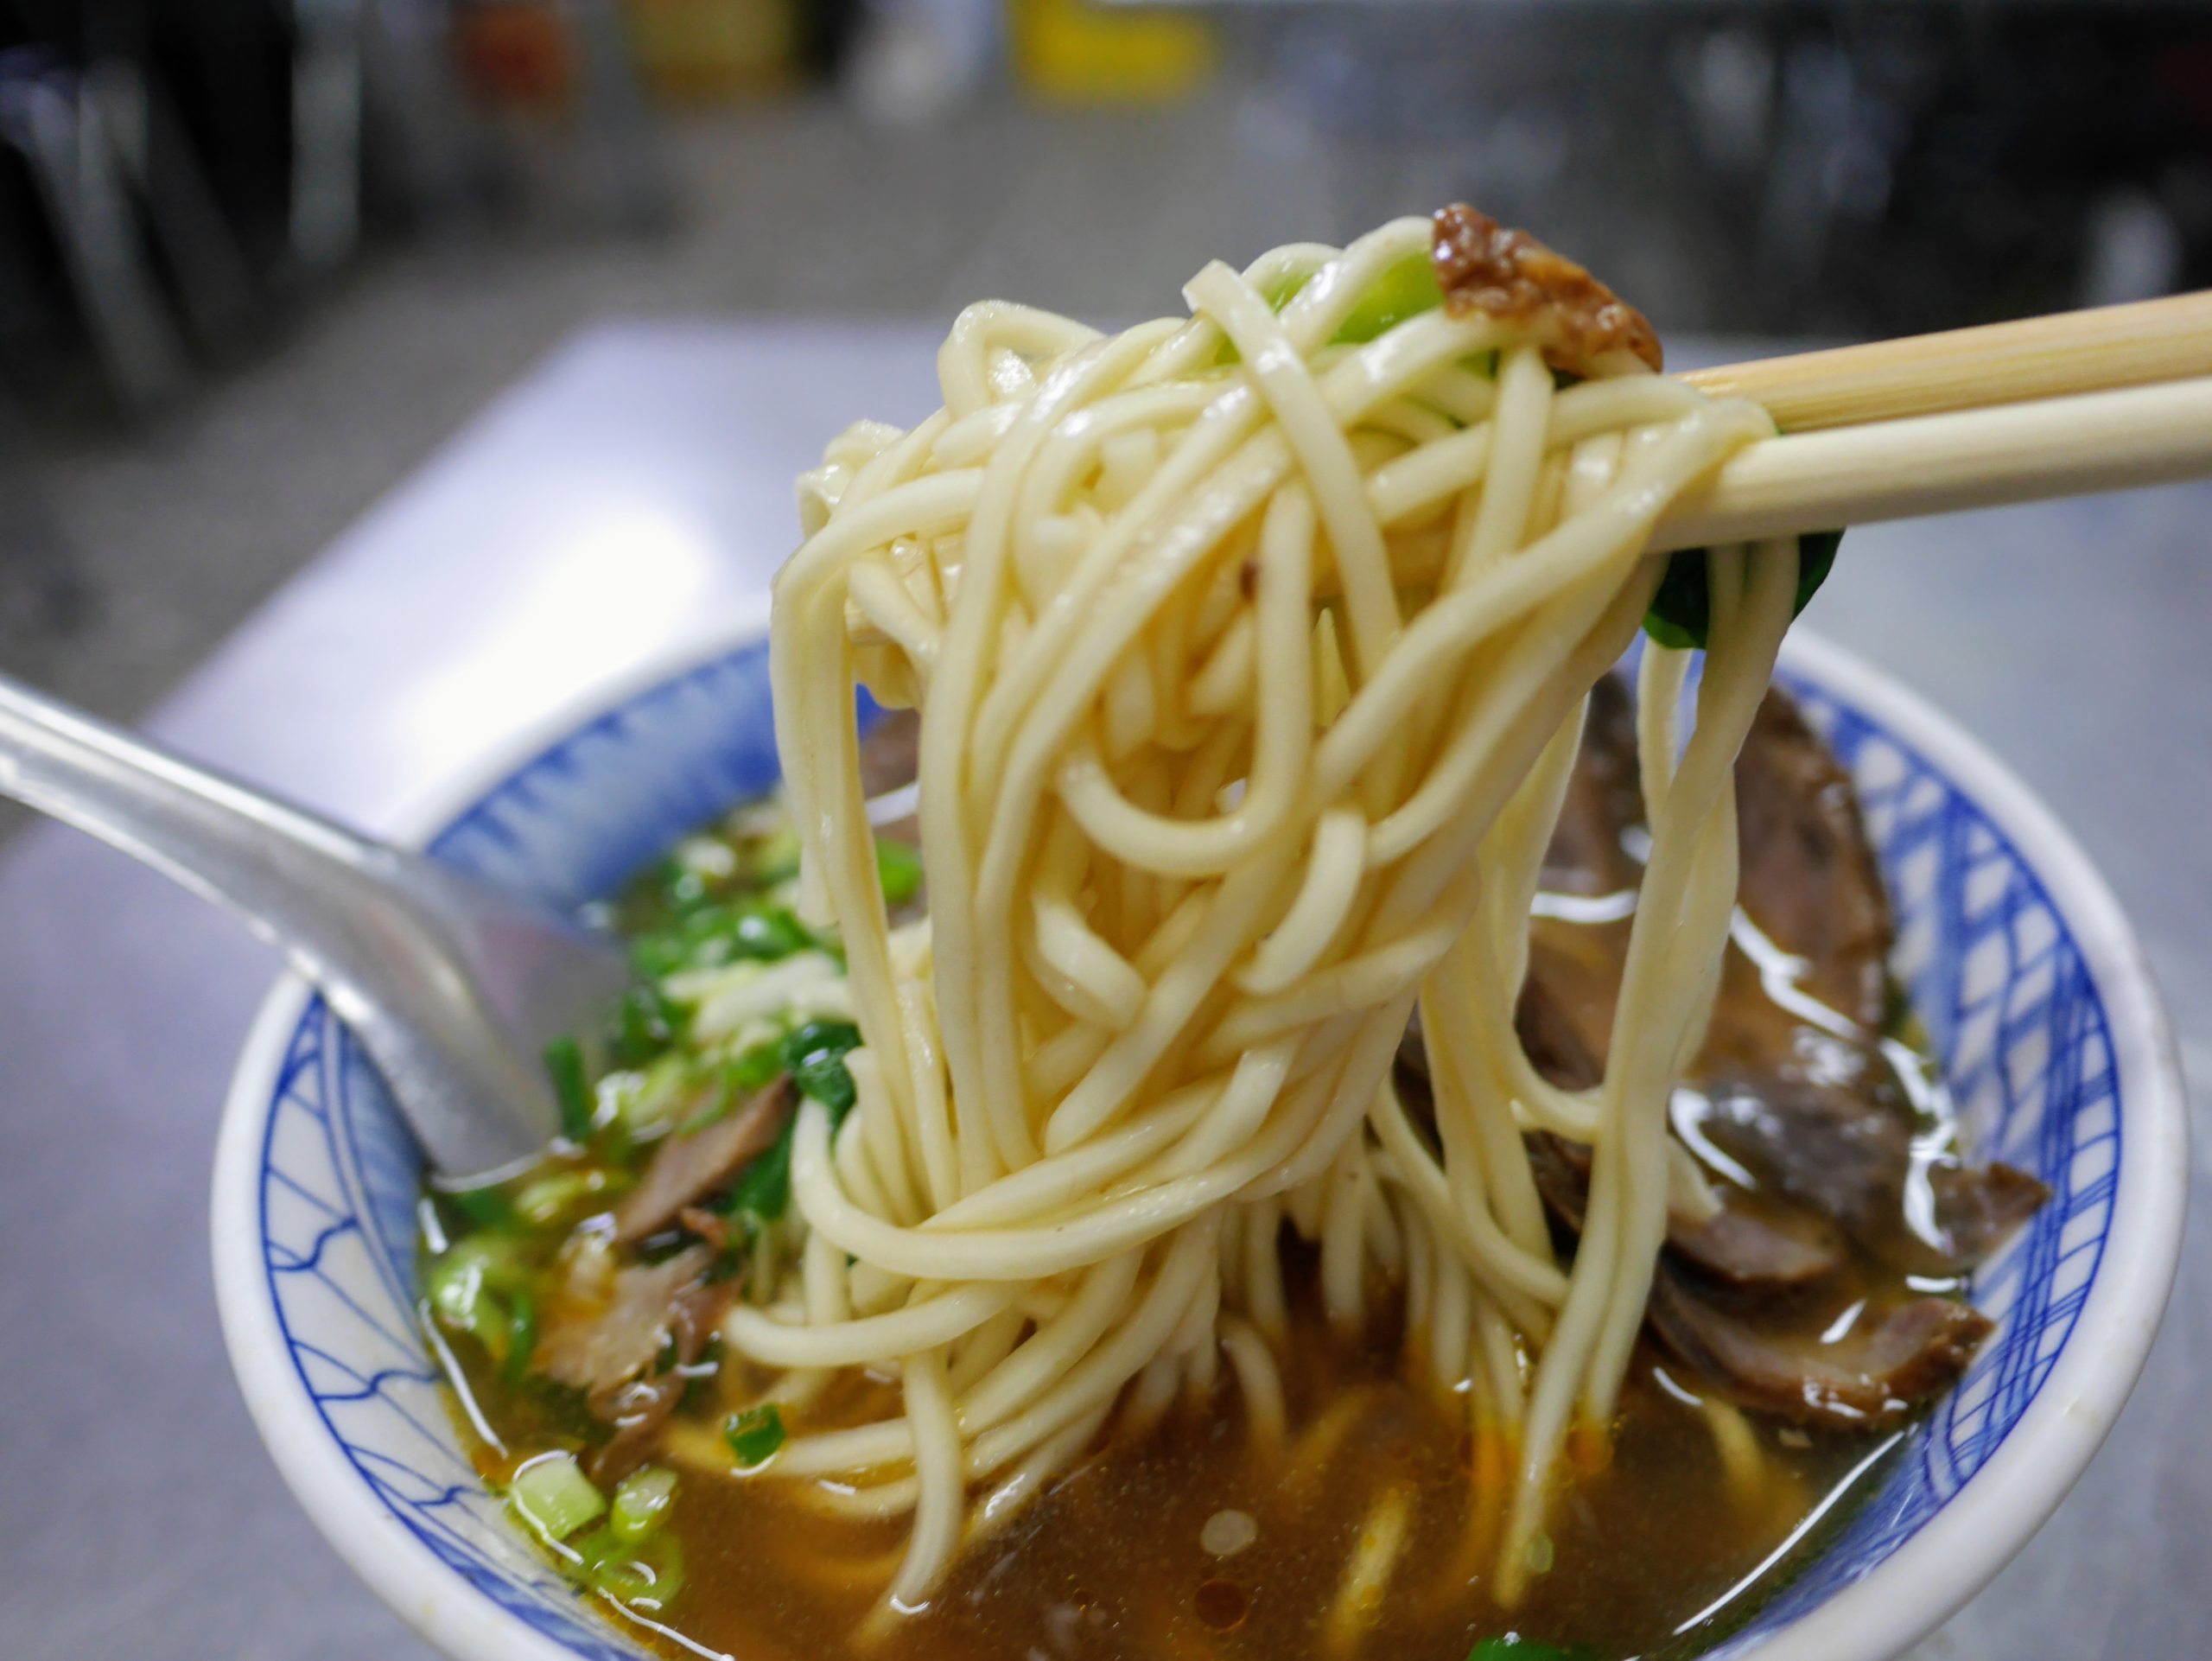 大師兄牛肉麺の麺